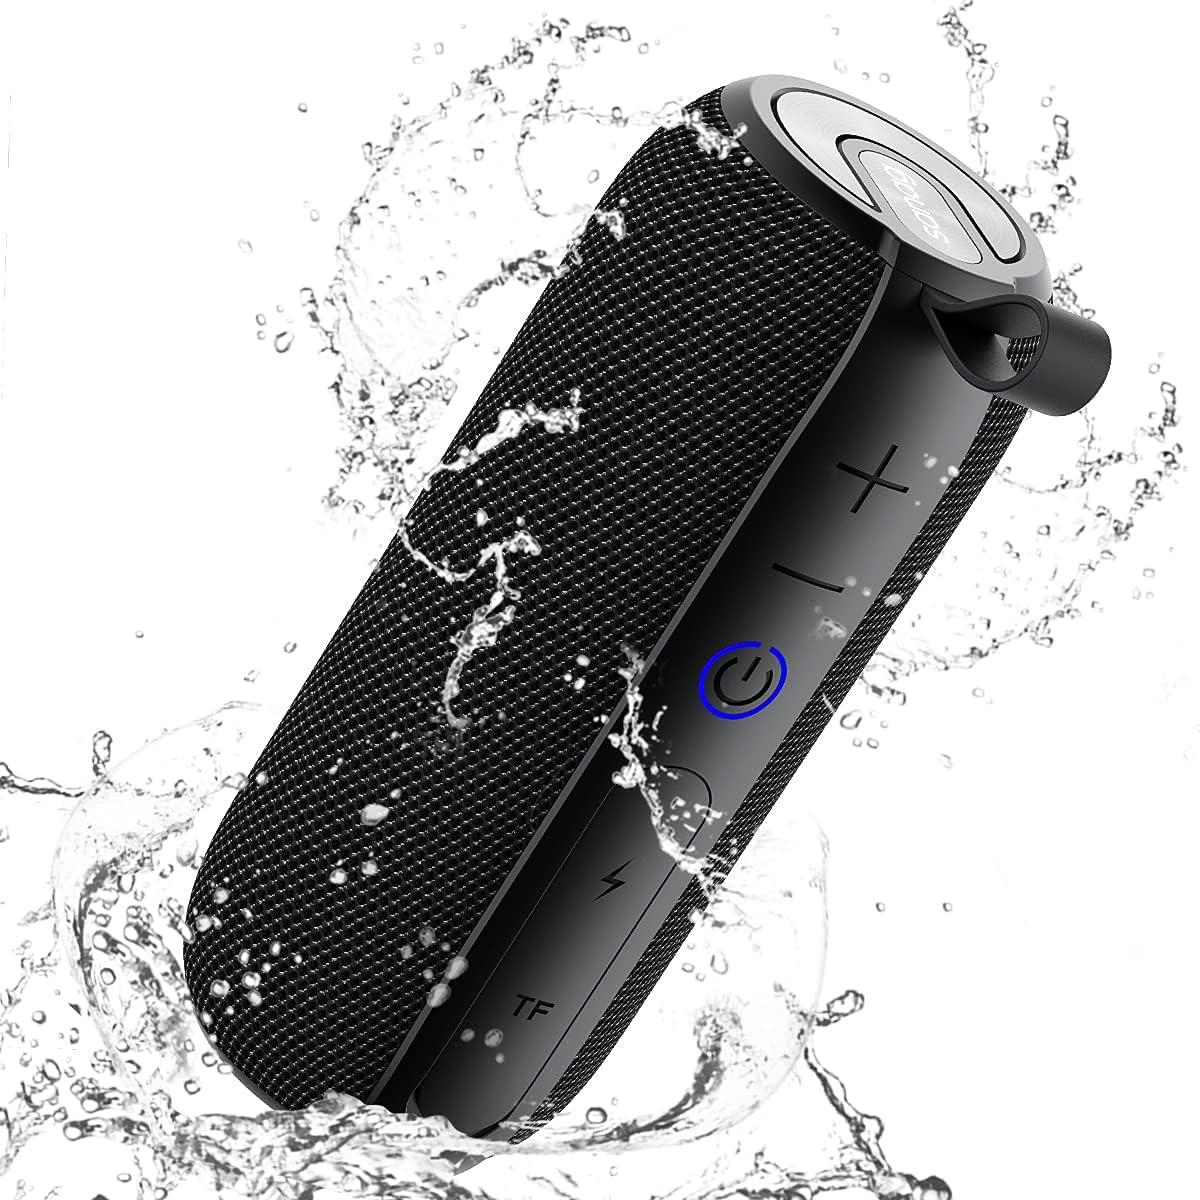 Sanag 25W Portable Bluetooth Speaker $27.96 Coupon